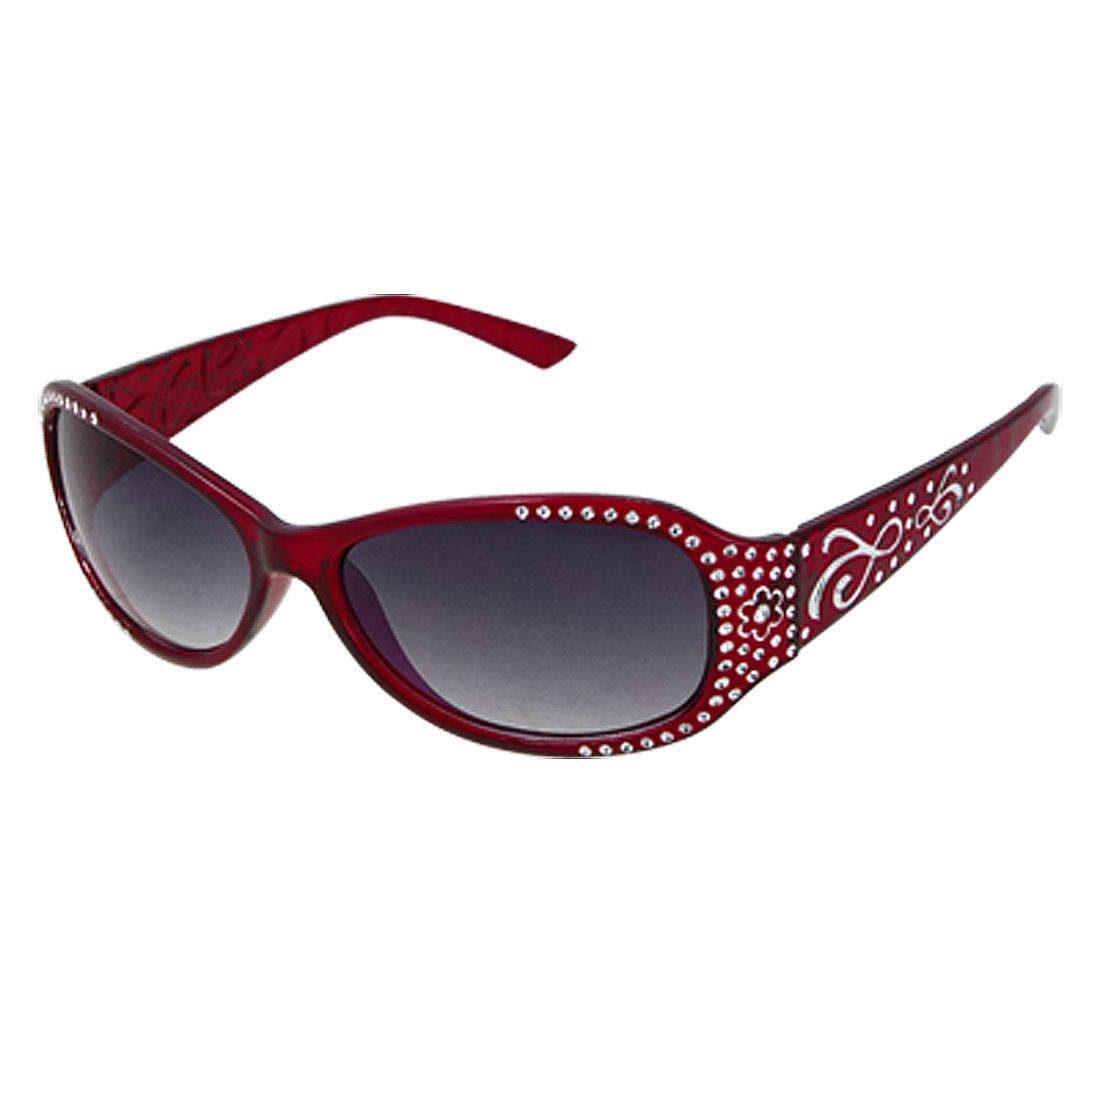 Ladies Gray Lens Sunglasses Glittery Detailing Burgundy Frame Eyewear